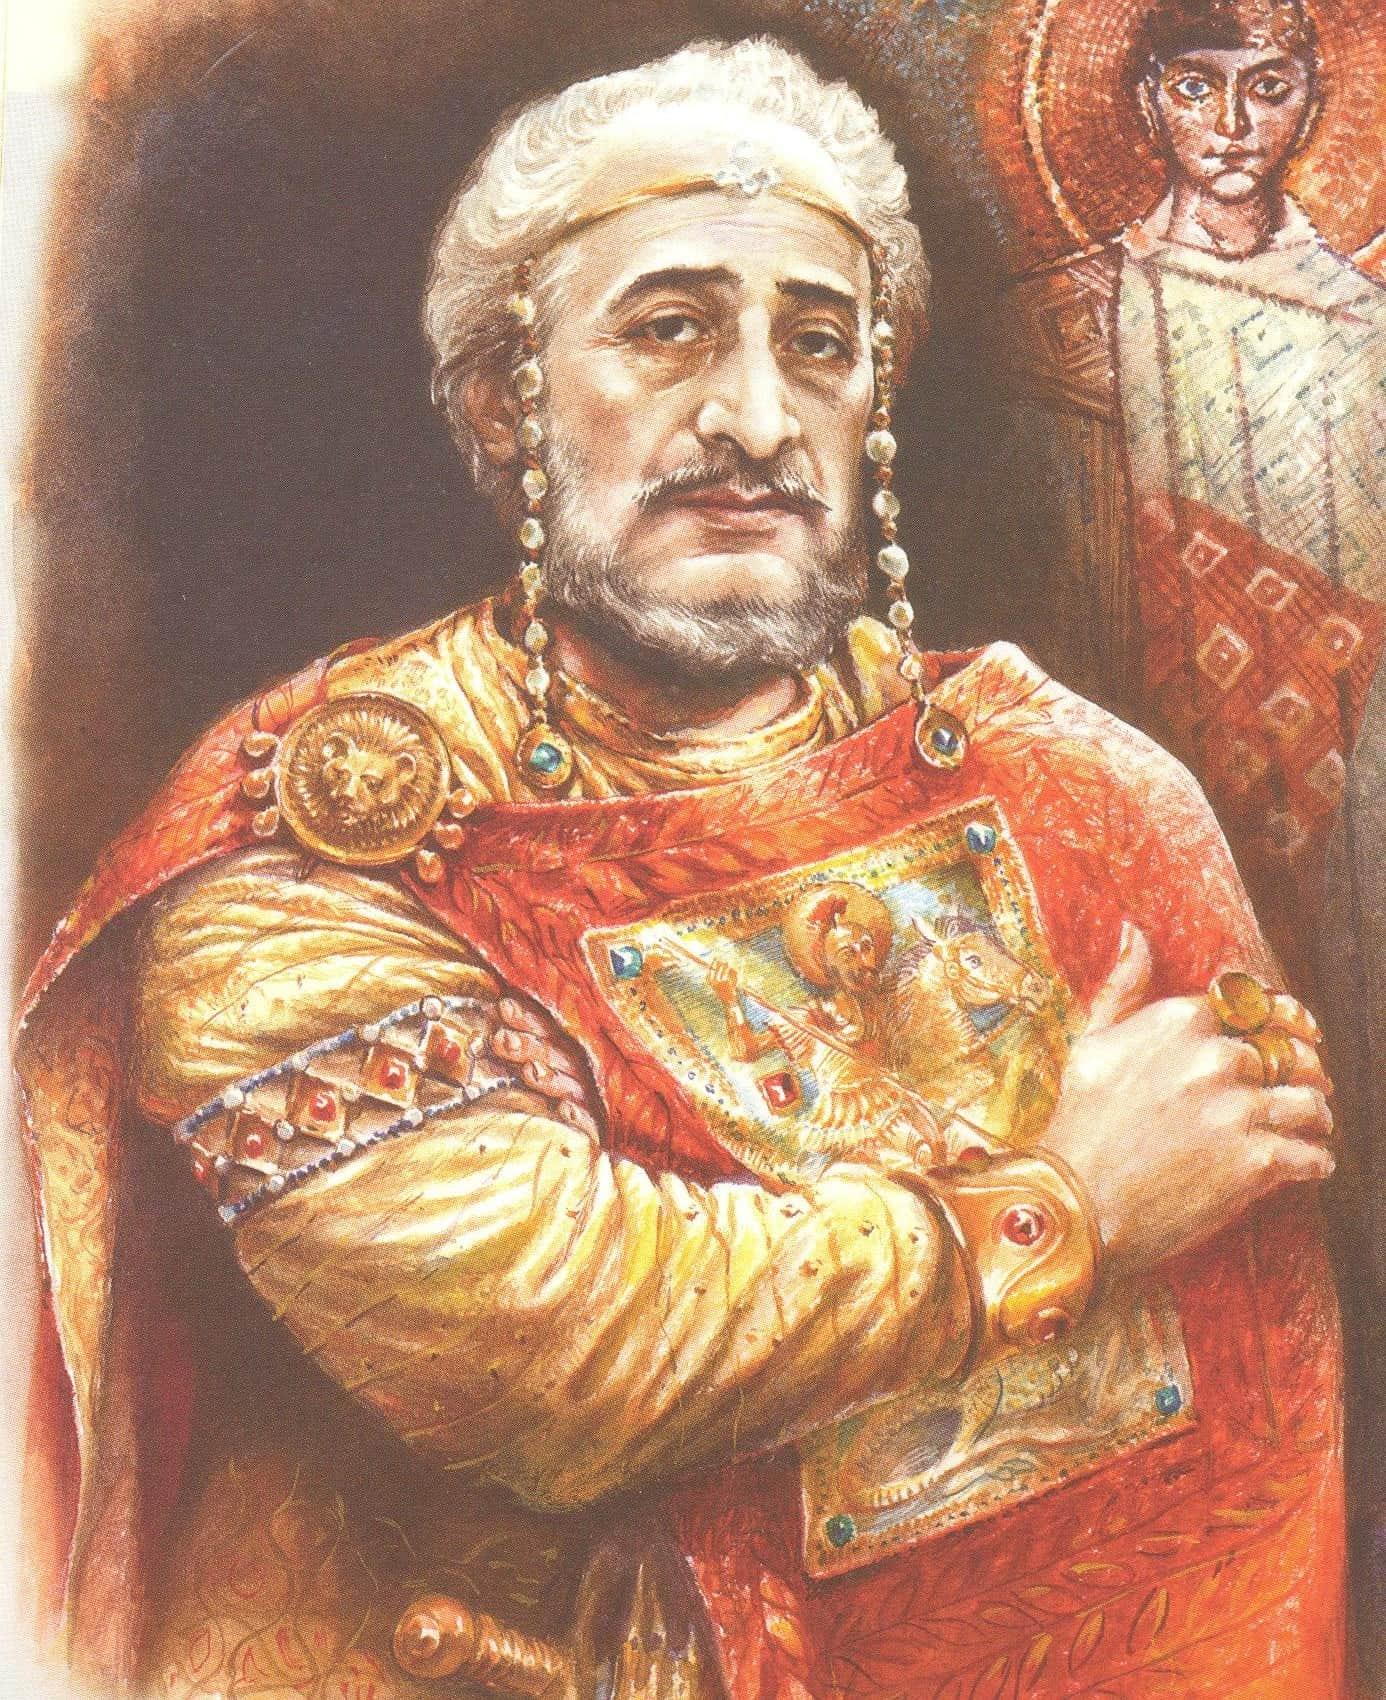 The-History-of-Byzantium.jpg